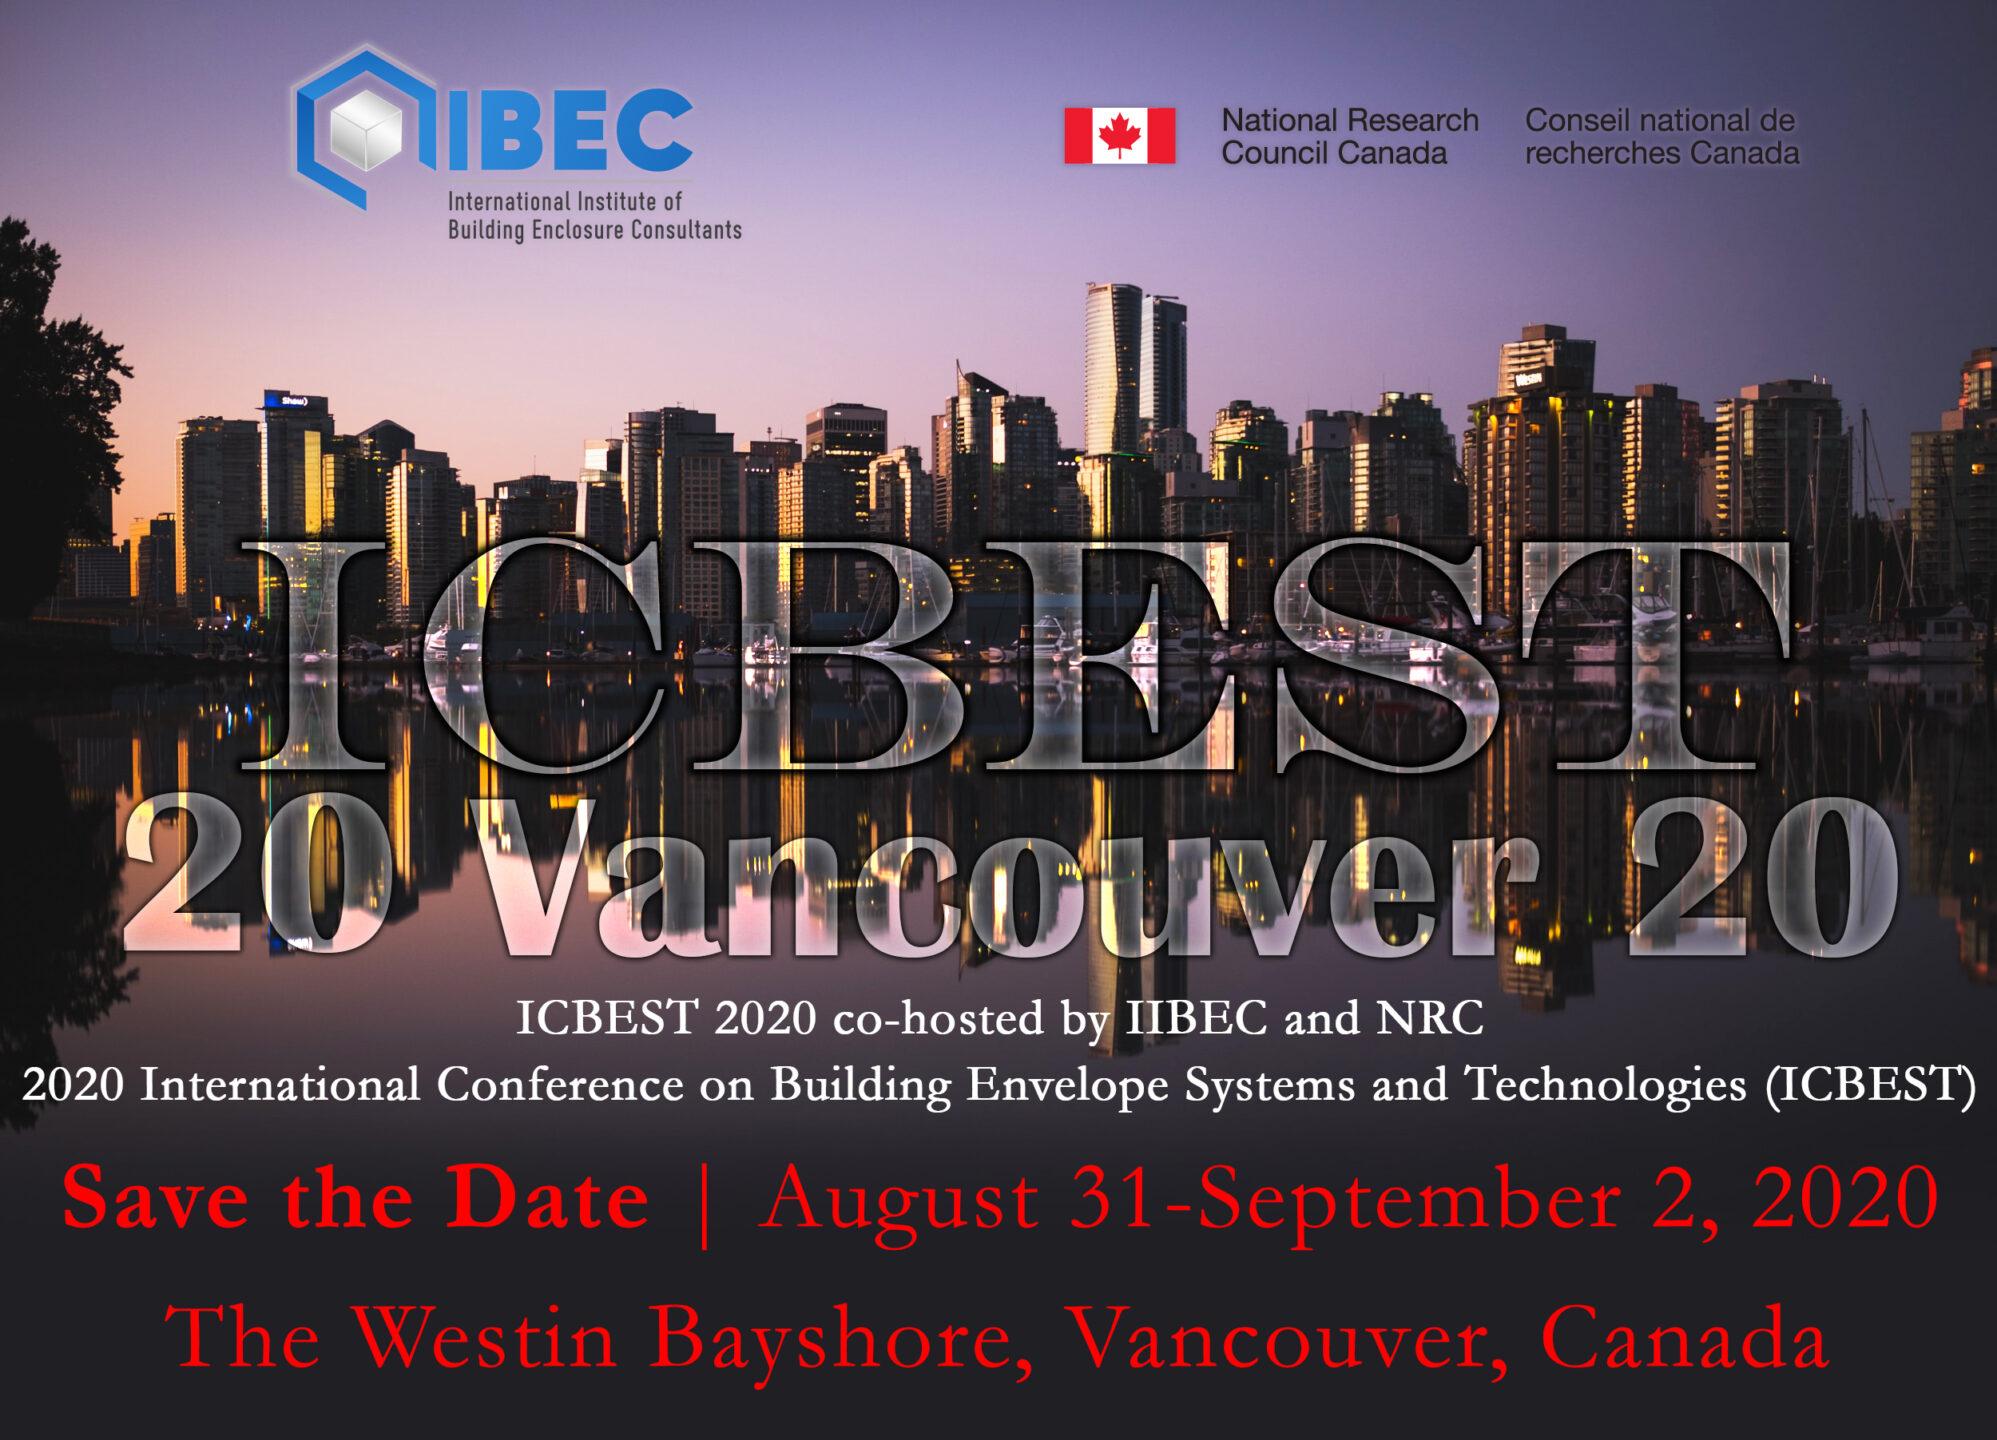 ICBEST 2020 Vancouver